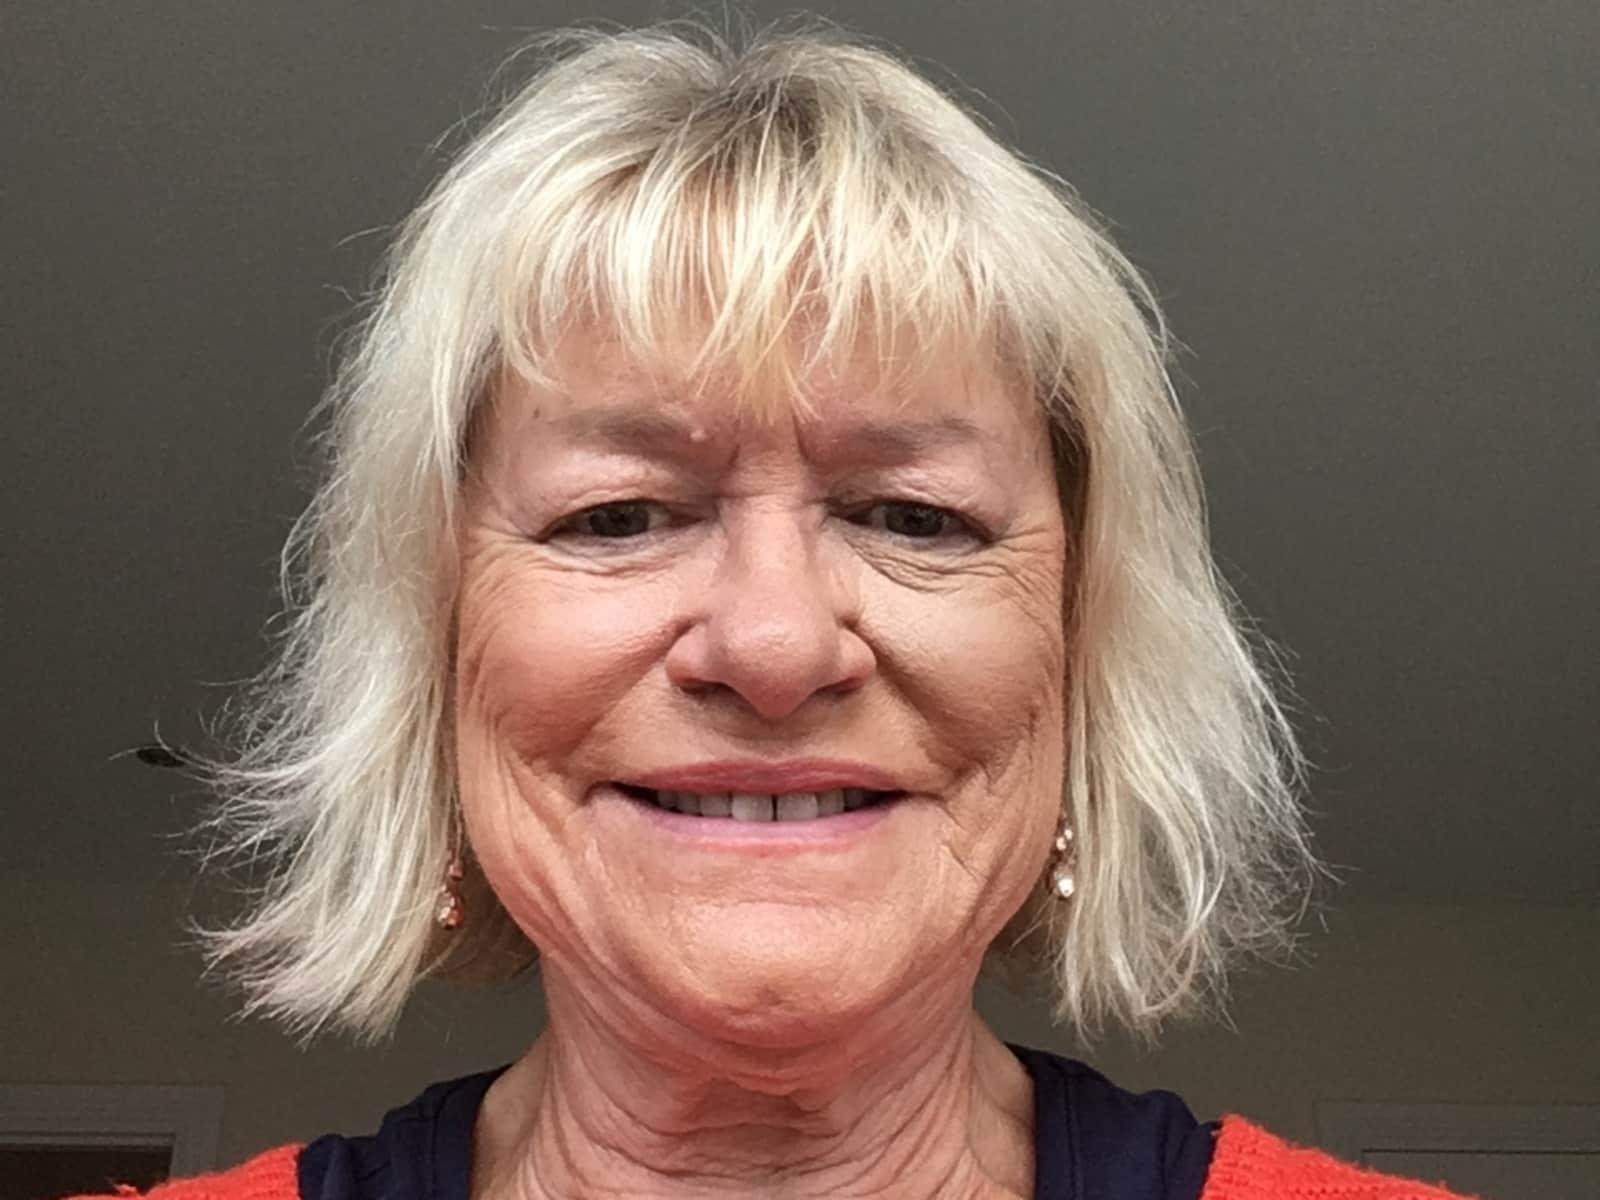 Gill from Bristol, United Kingdom